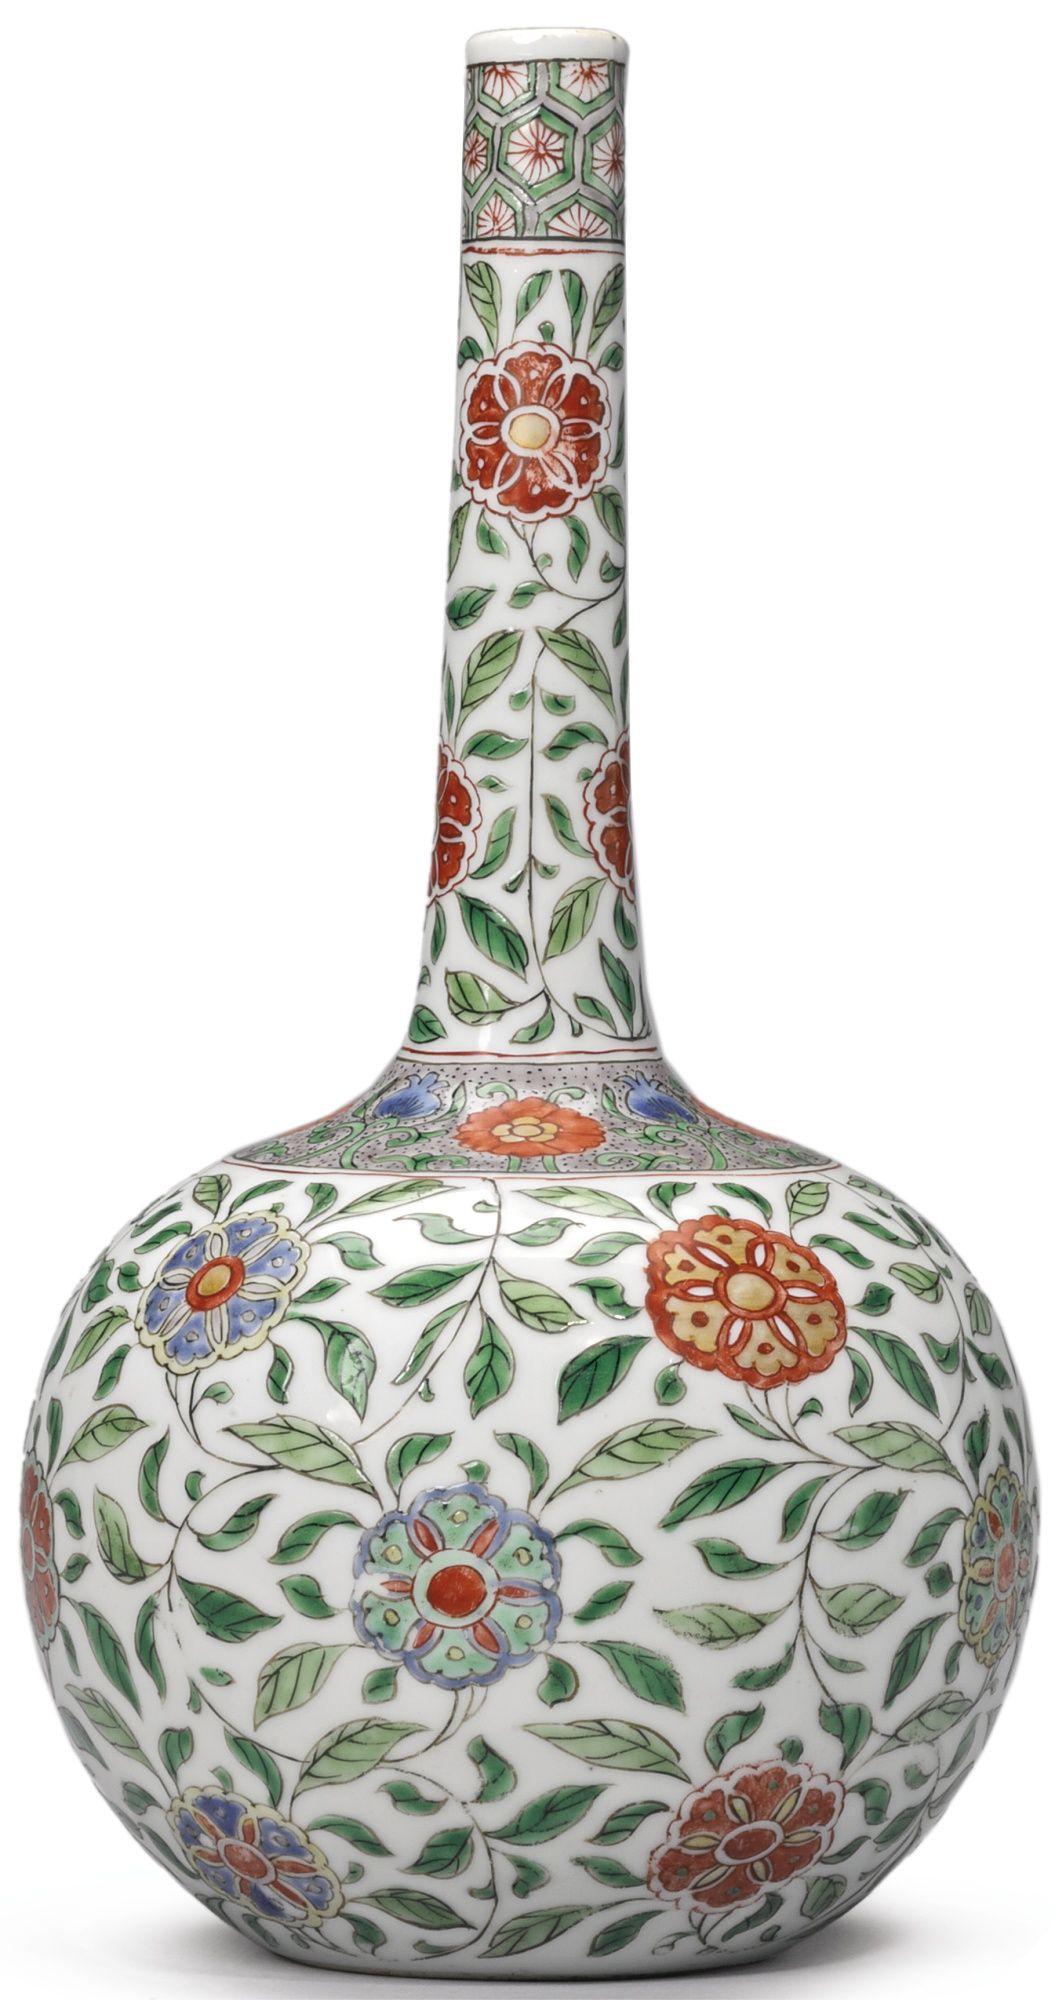 (Qing) Famille Verte. A Famille Verte bottle Vase. Qing dynasty, Kangxi period. ca 18th century CE.